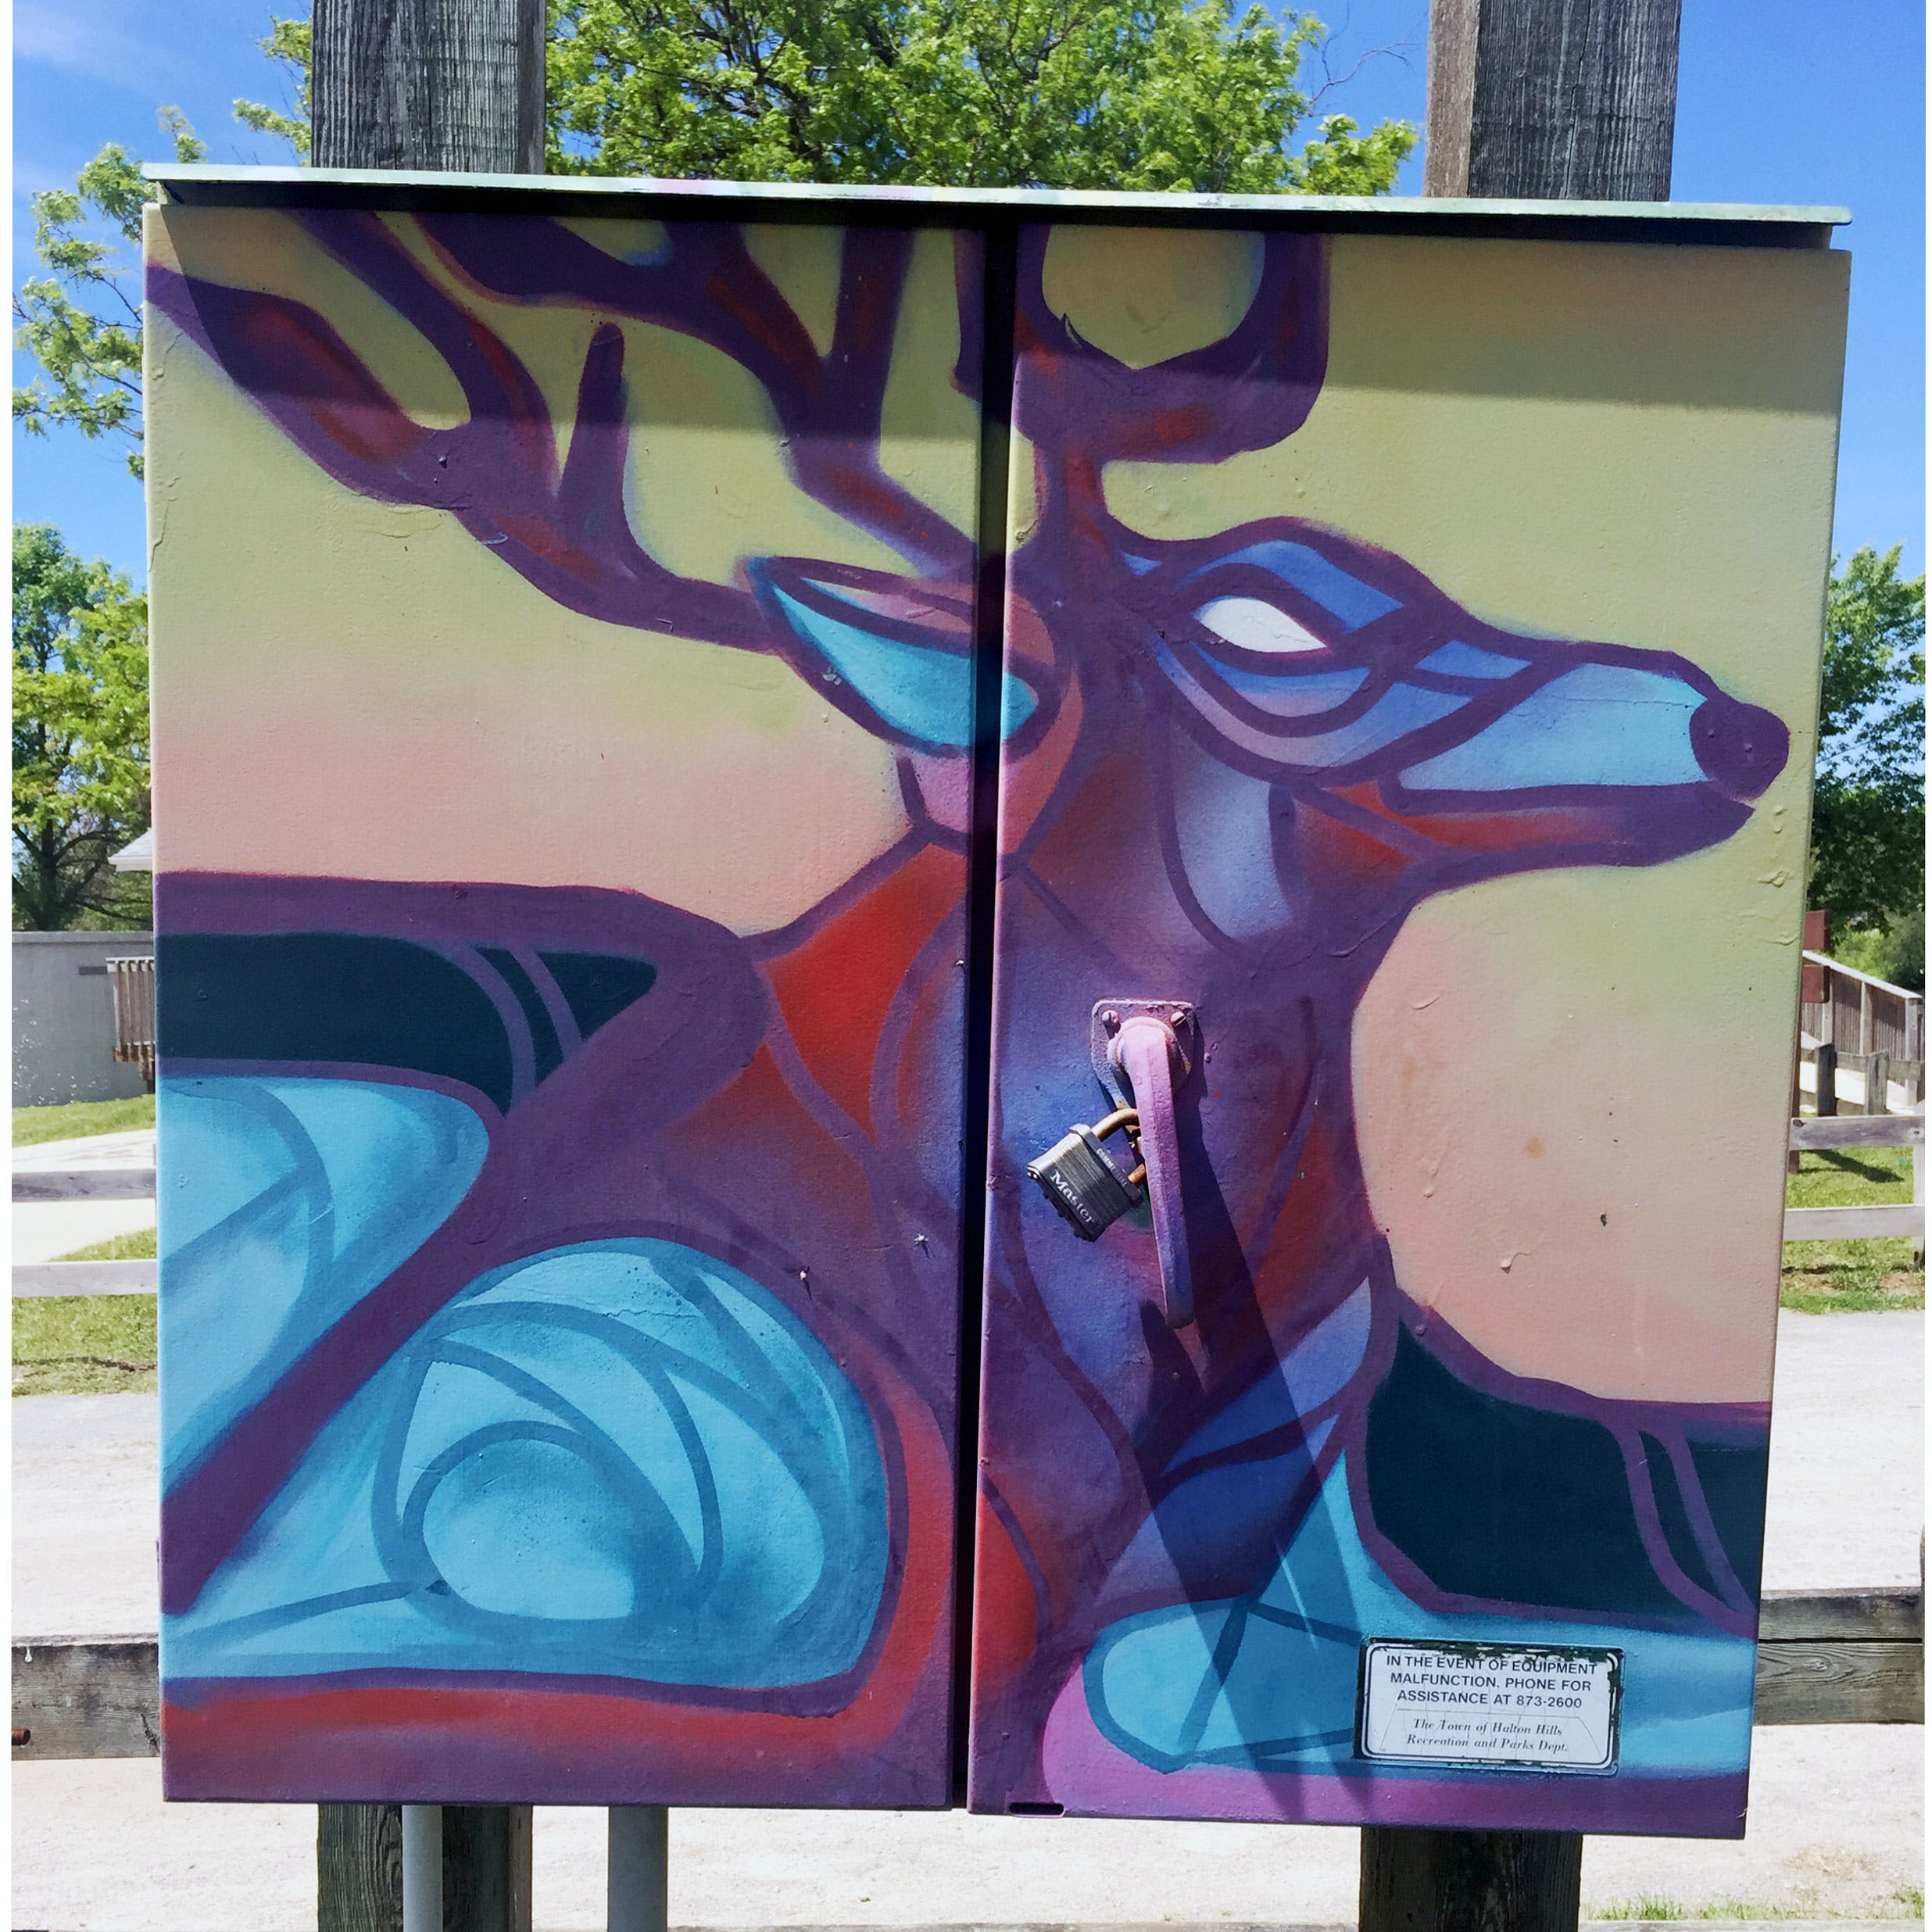 Graffiti Murals on Utility Boxes